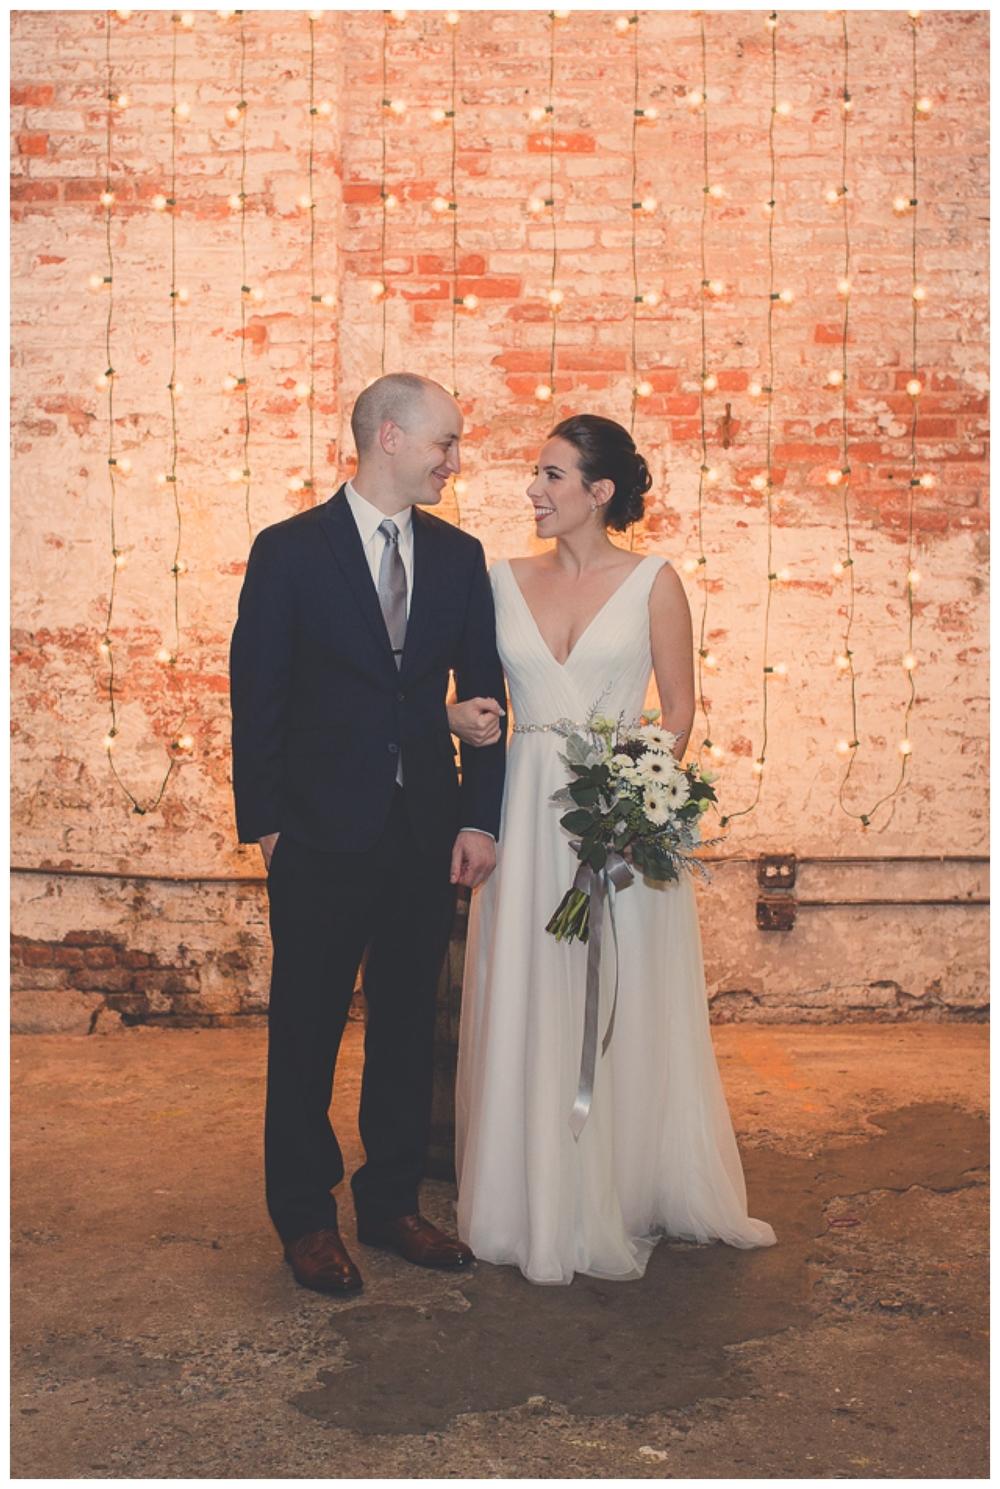 TaylorLaurenBarker - Stephanie&Carmine - NYE Wedding_0004.jpg